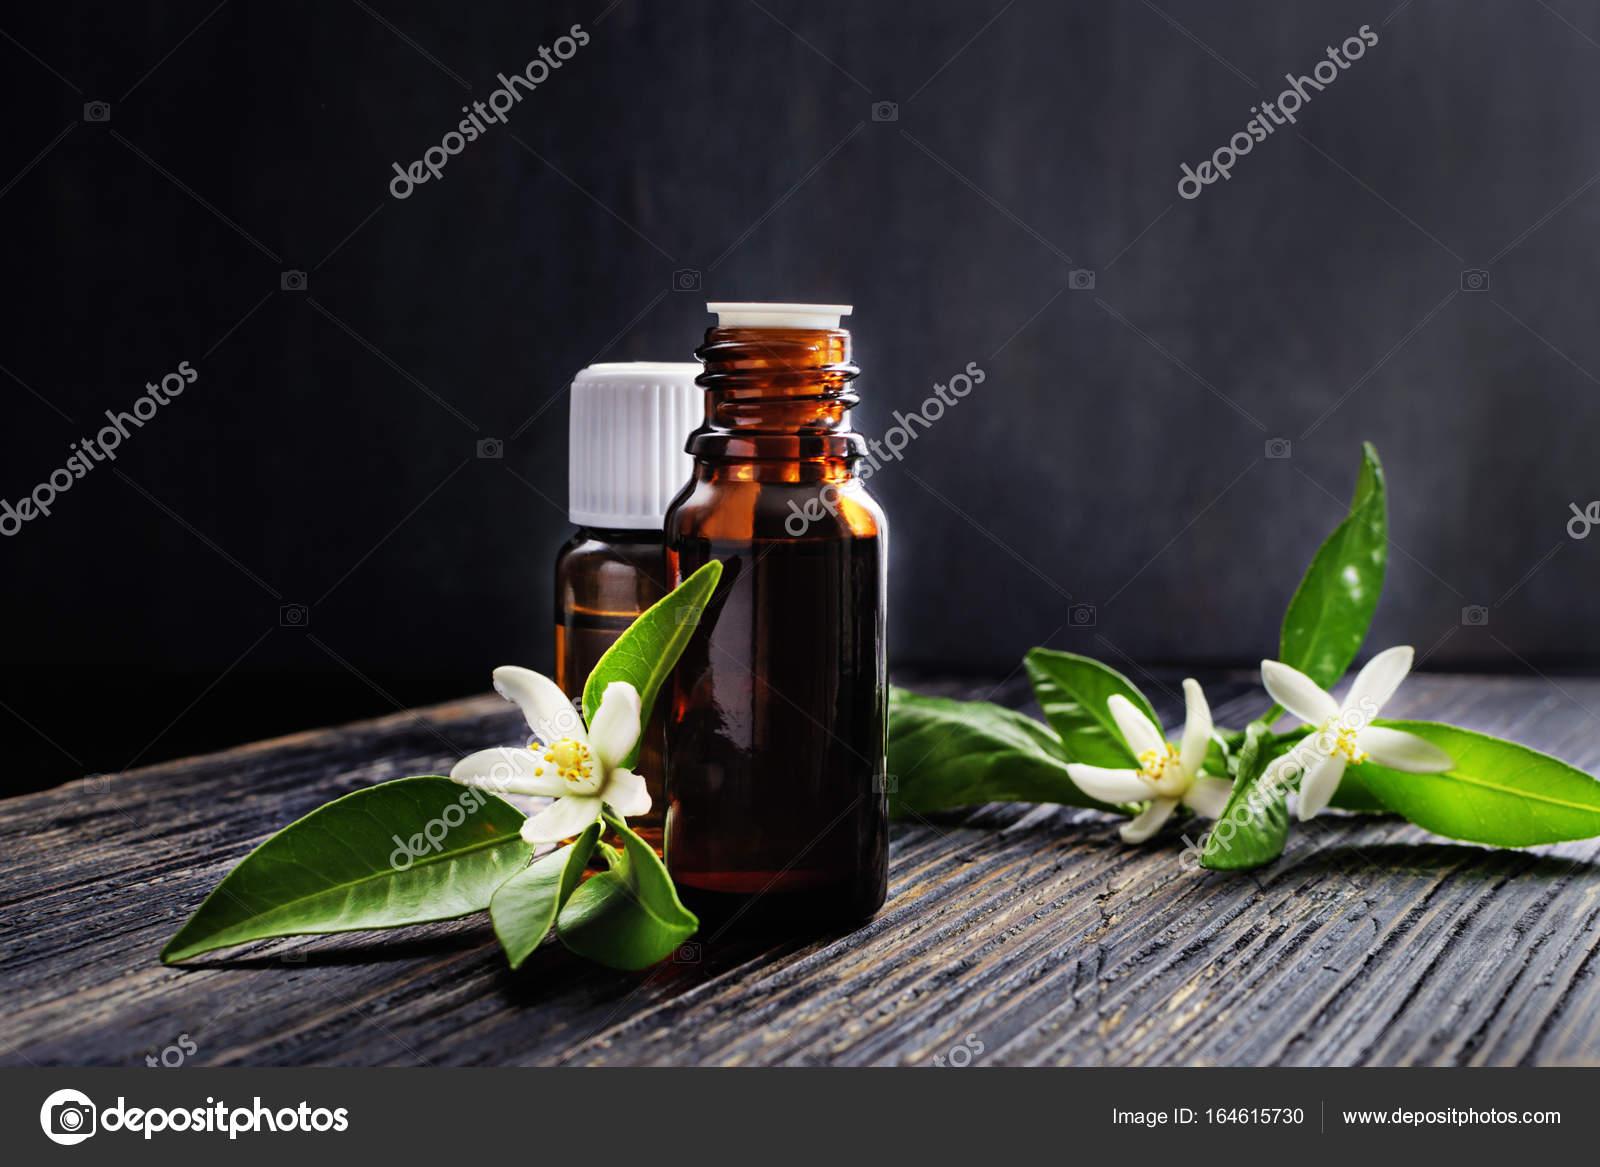 Neroli essential oil stock photo laroinovaolga 164615730 neroli citrus aurantium essential oil in a brown glass bottles and fresh white flowers photo by laroinovaolga mightylinksfo